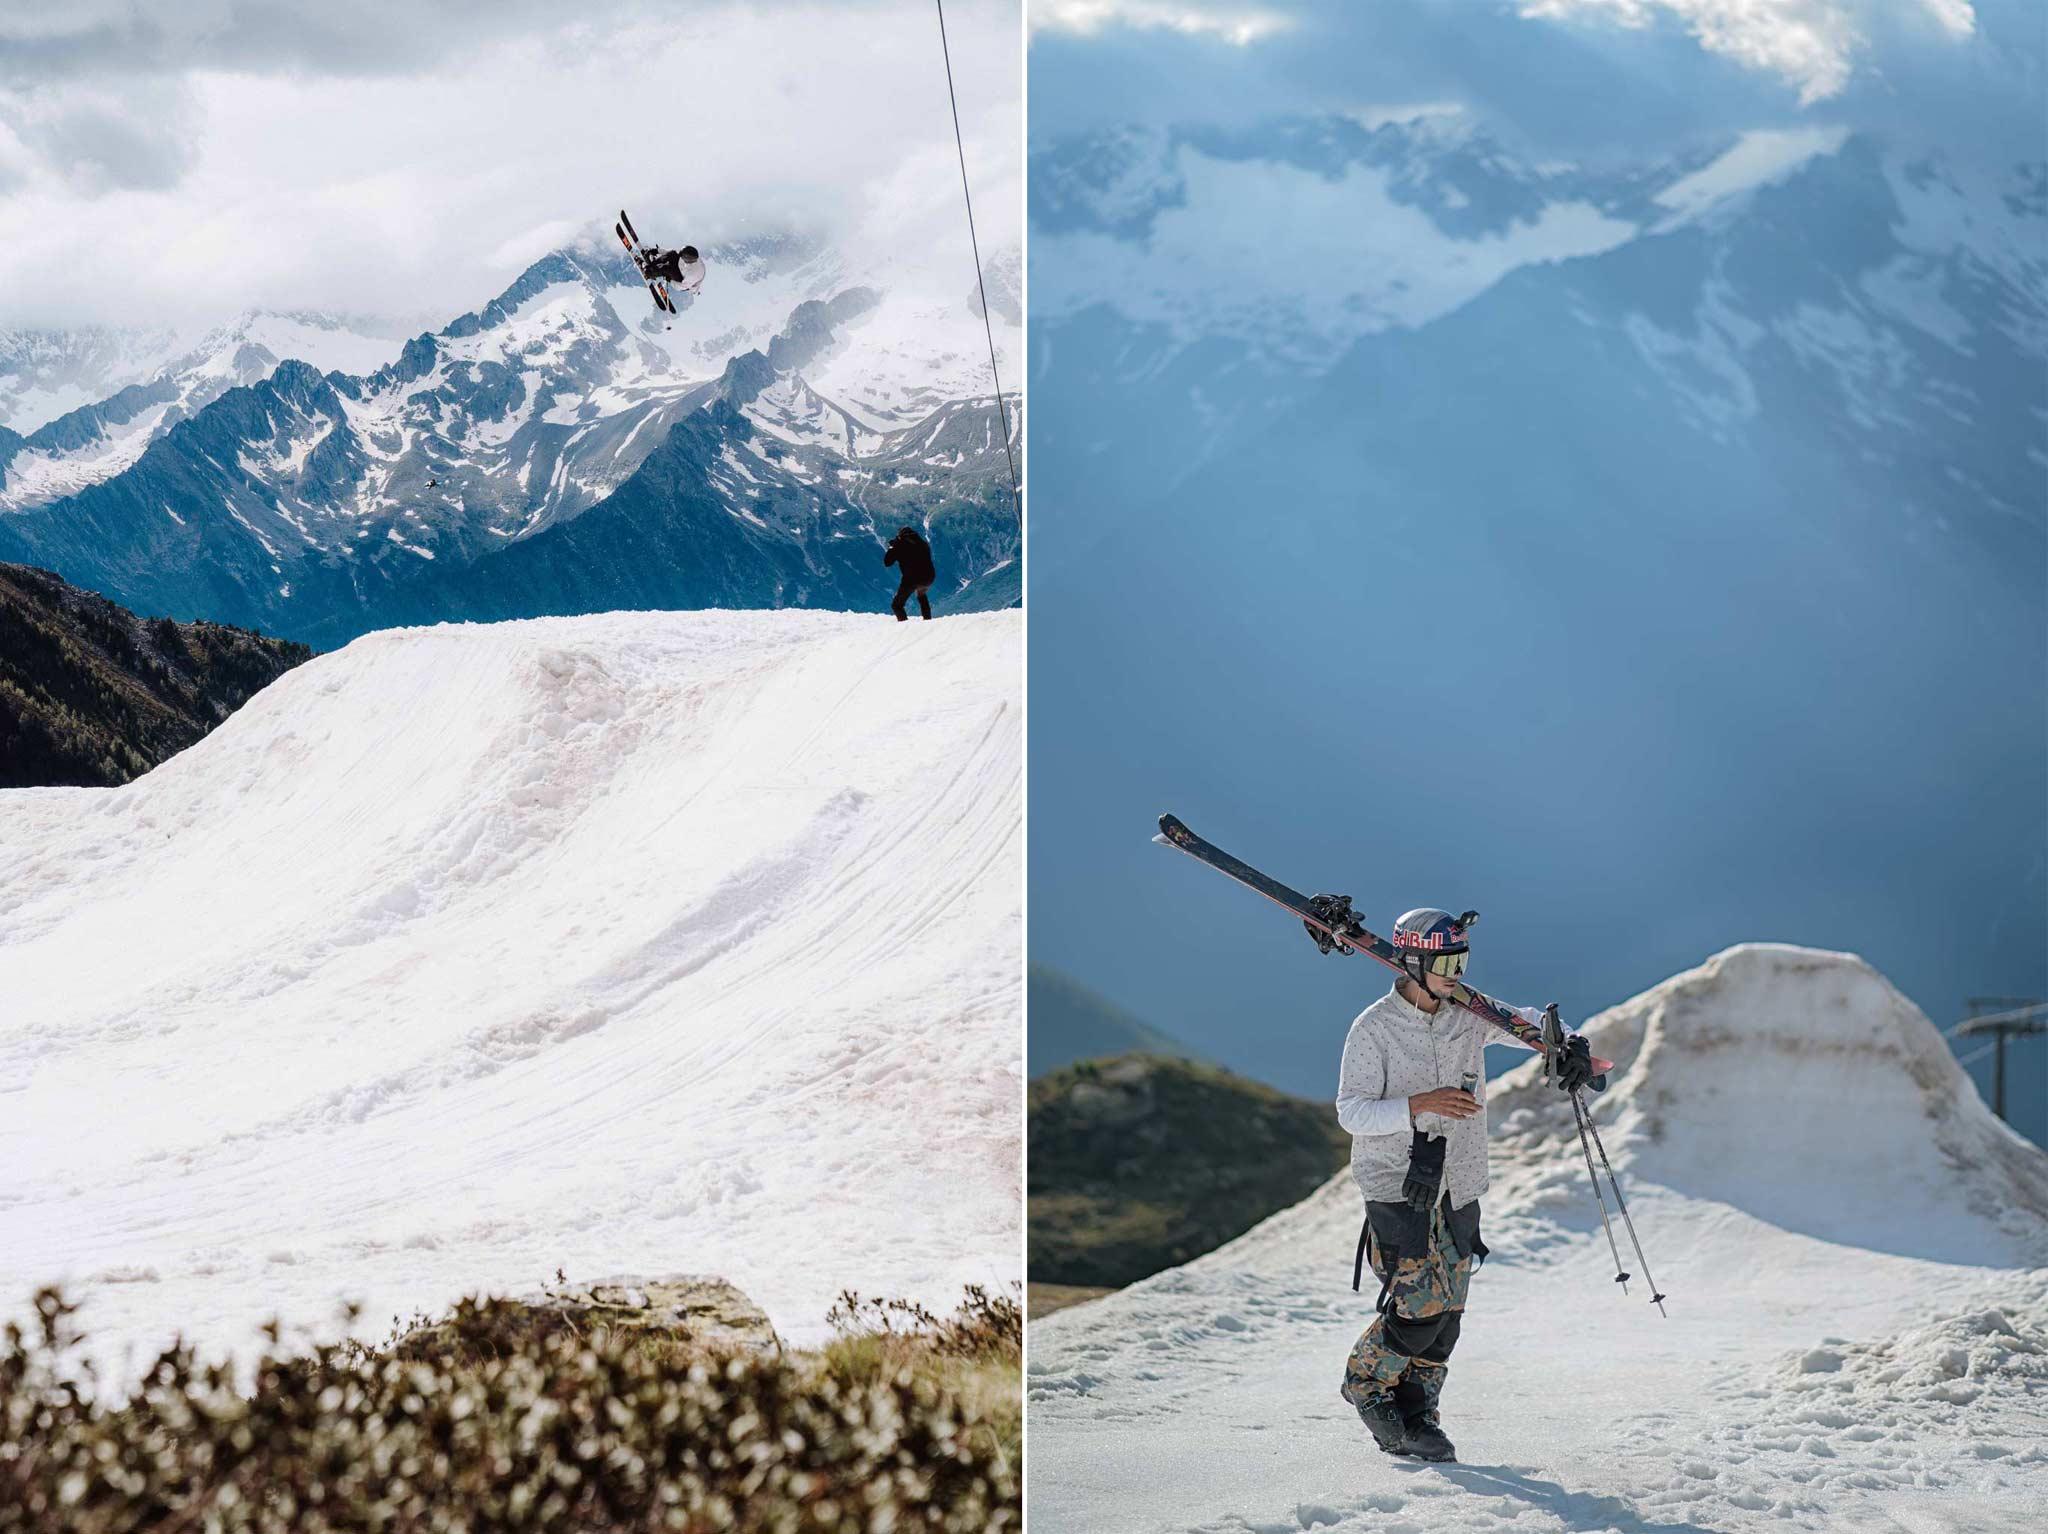 SuperSpringSesh 2020 by Markus Eder - Links: Simone Canal, rechts: Markus Eder - Location: Klausberg